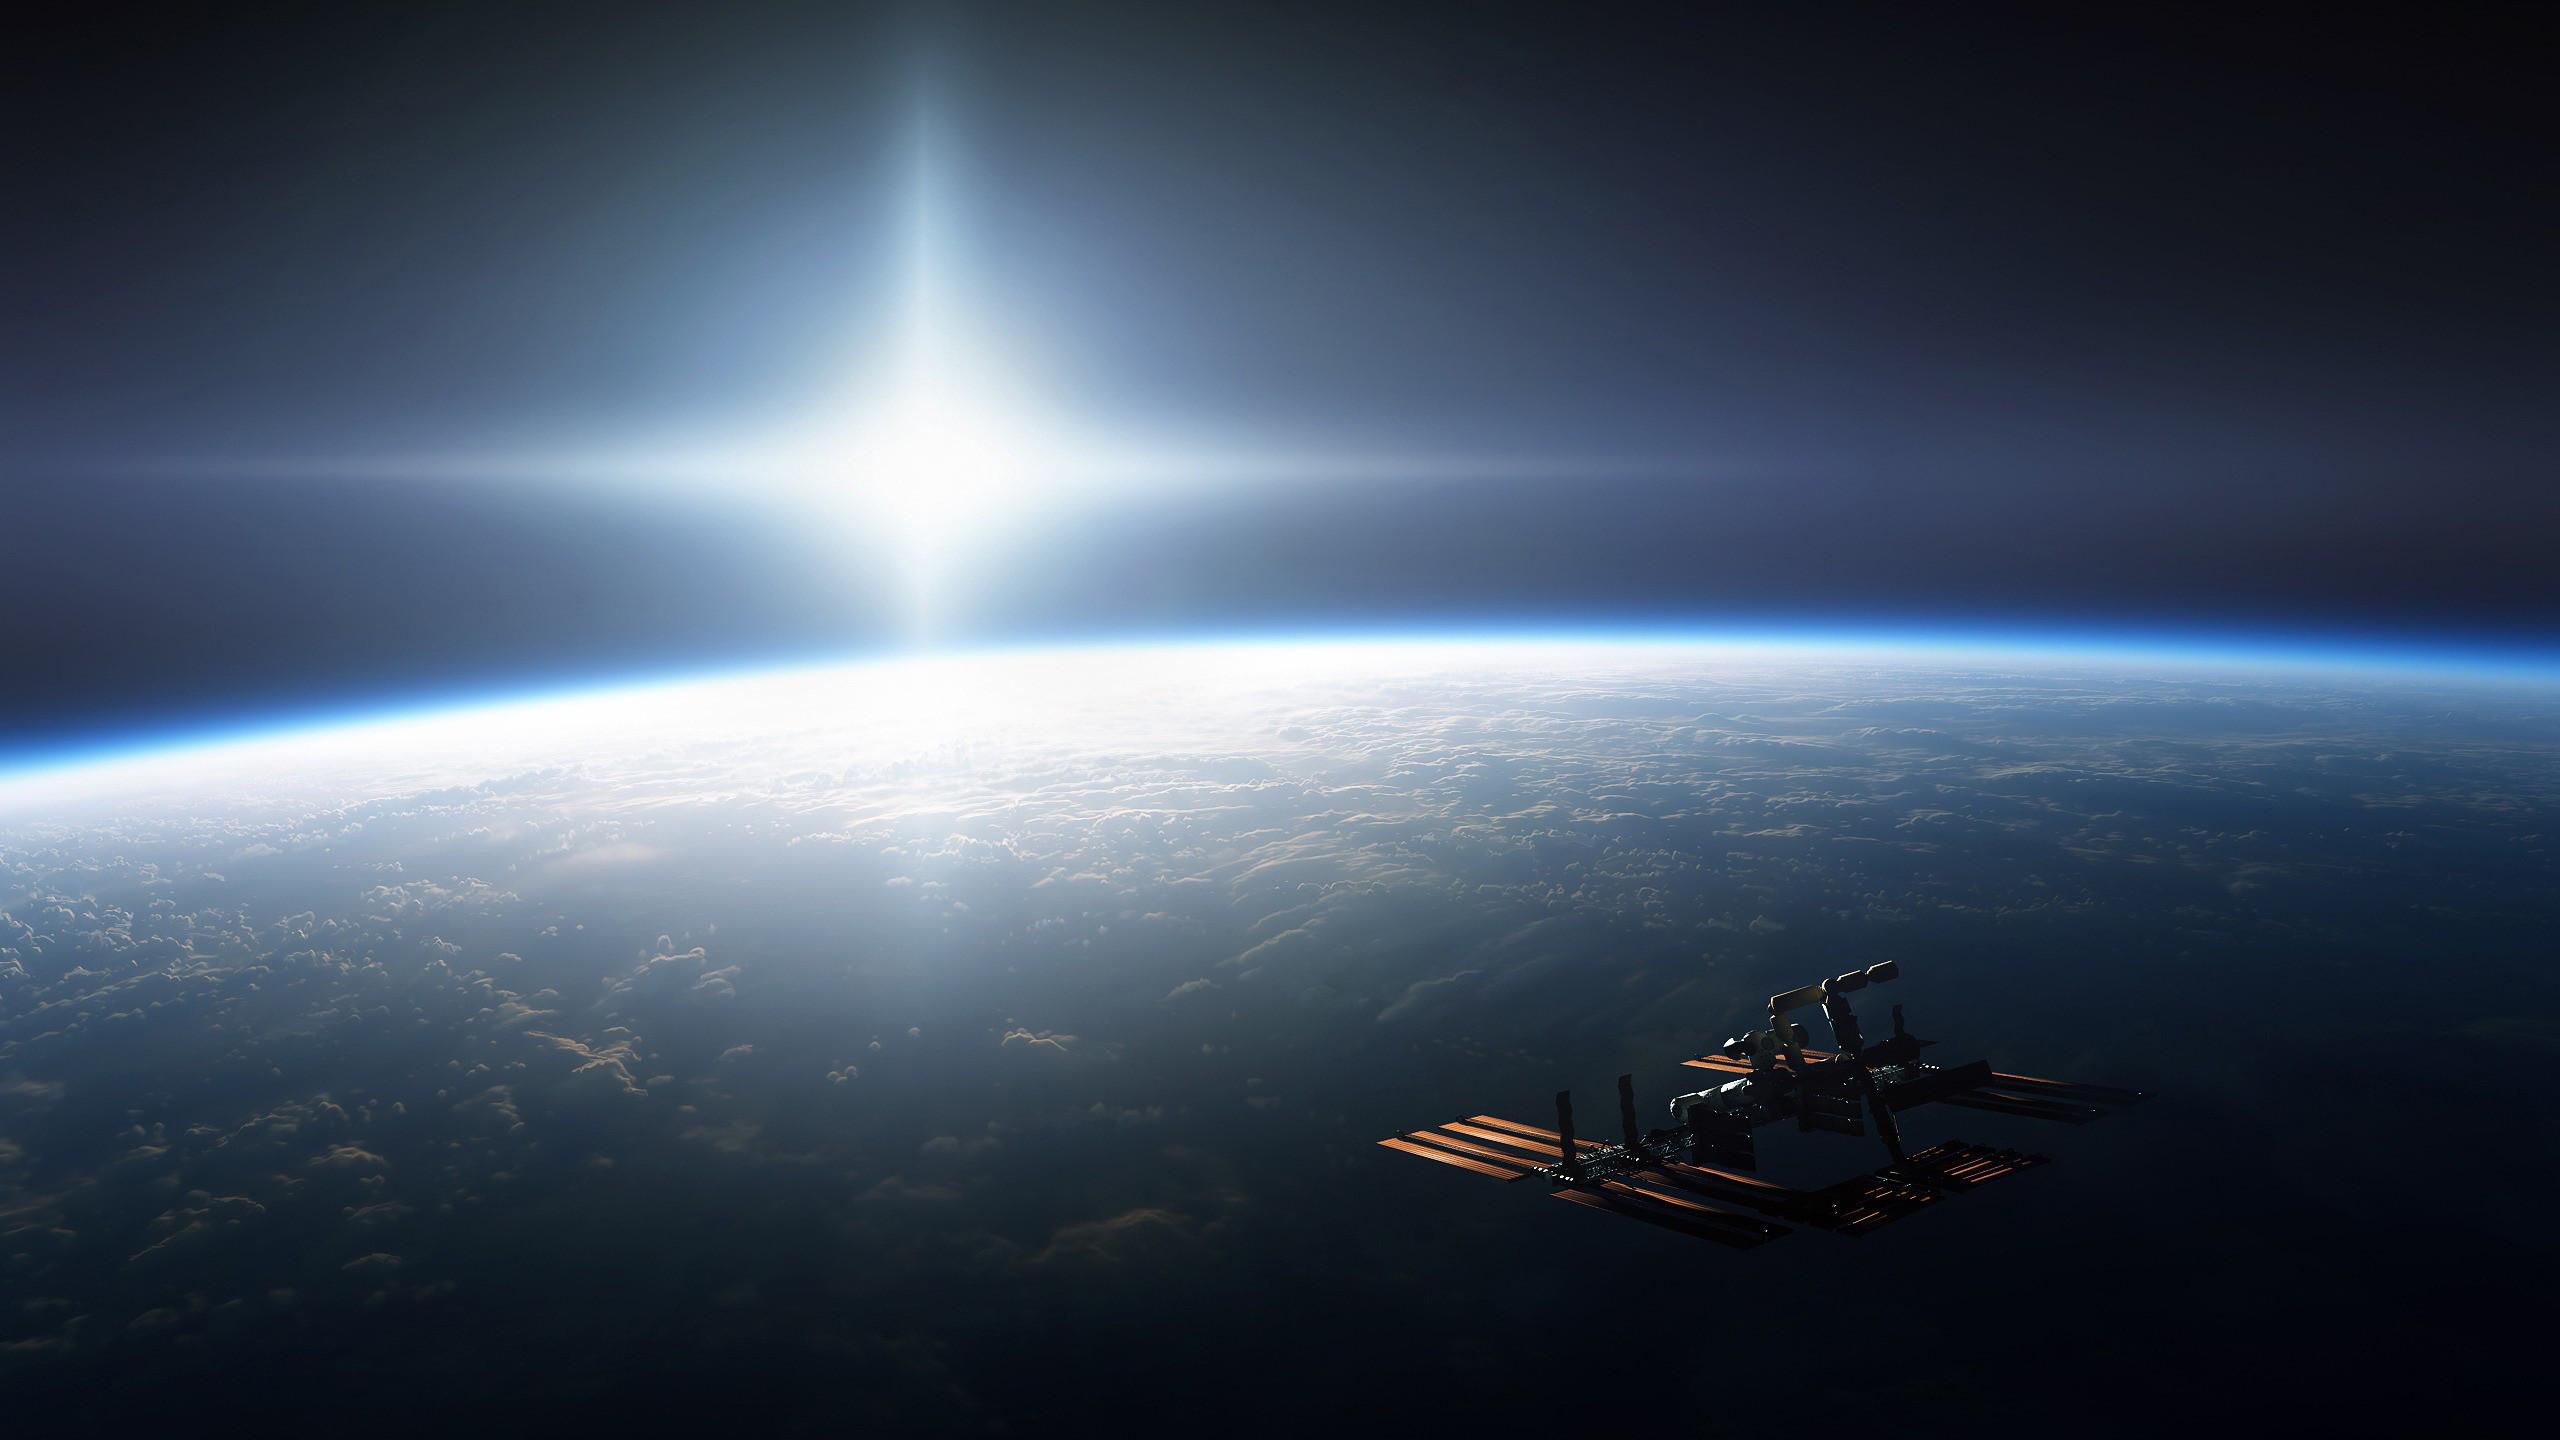 Explore Star Space, Wallpaper Pc, and more! Nasa Wallpaper 21C